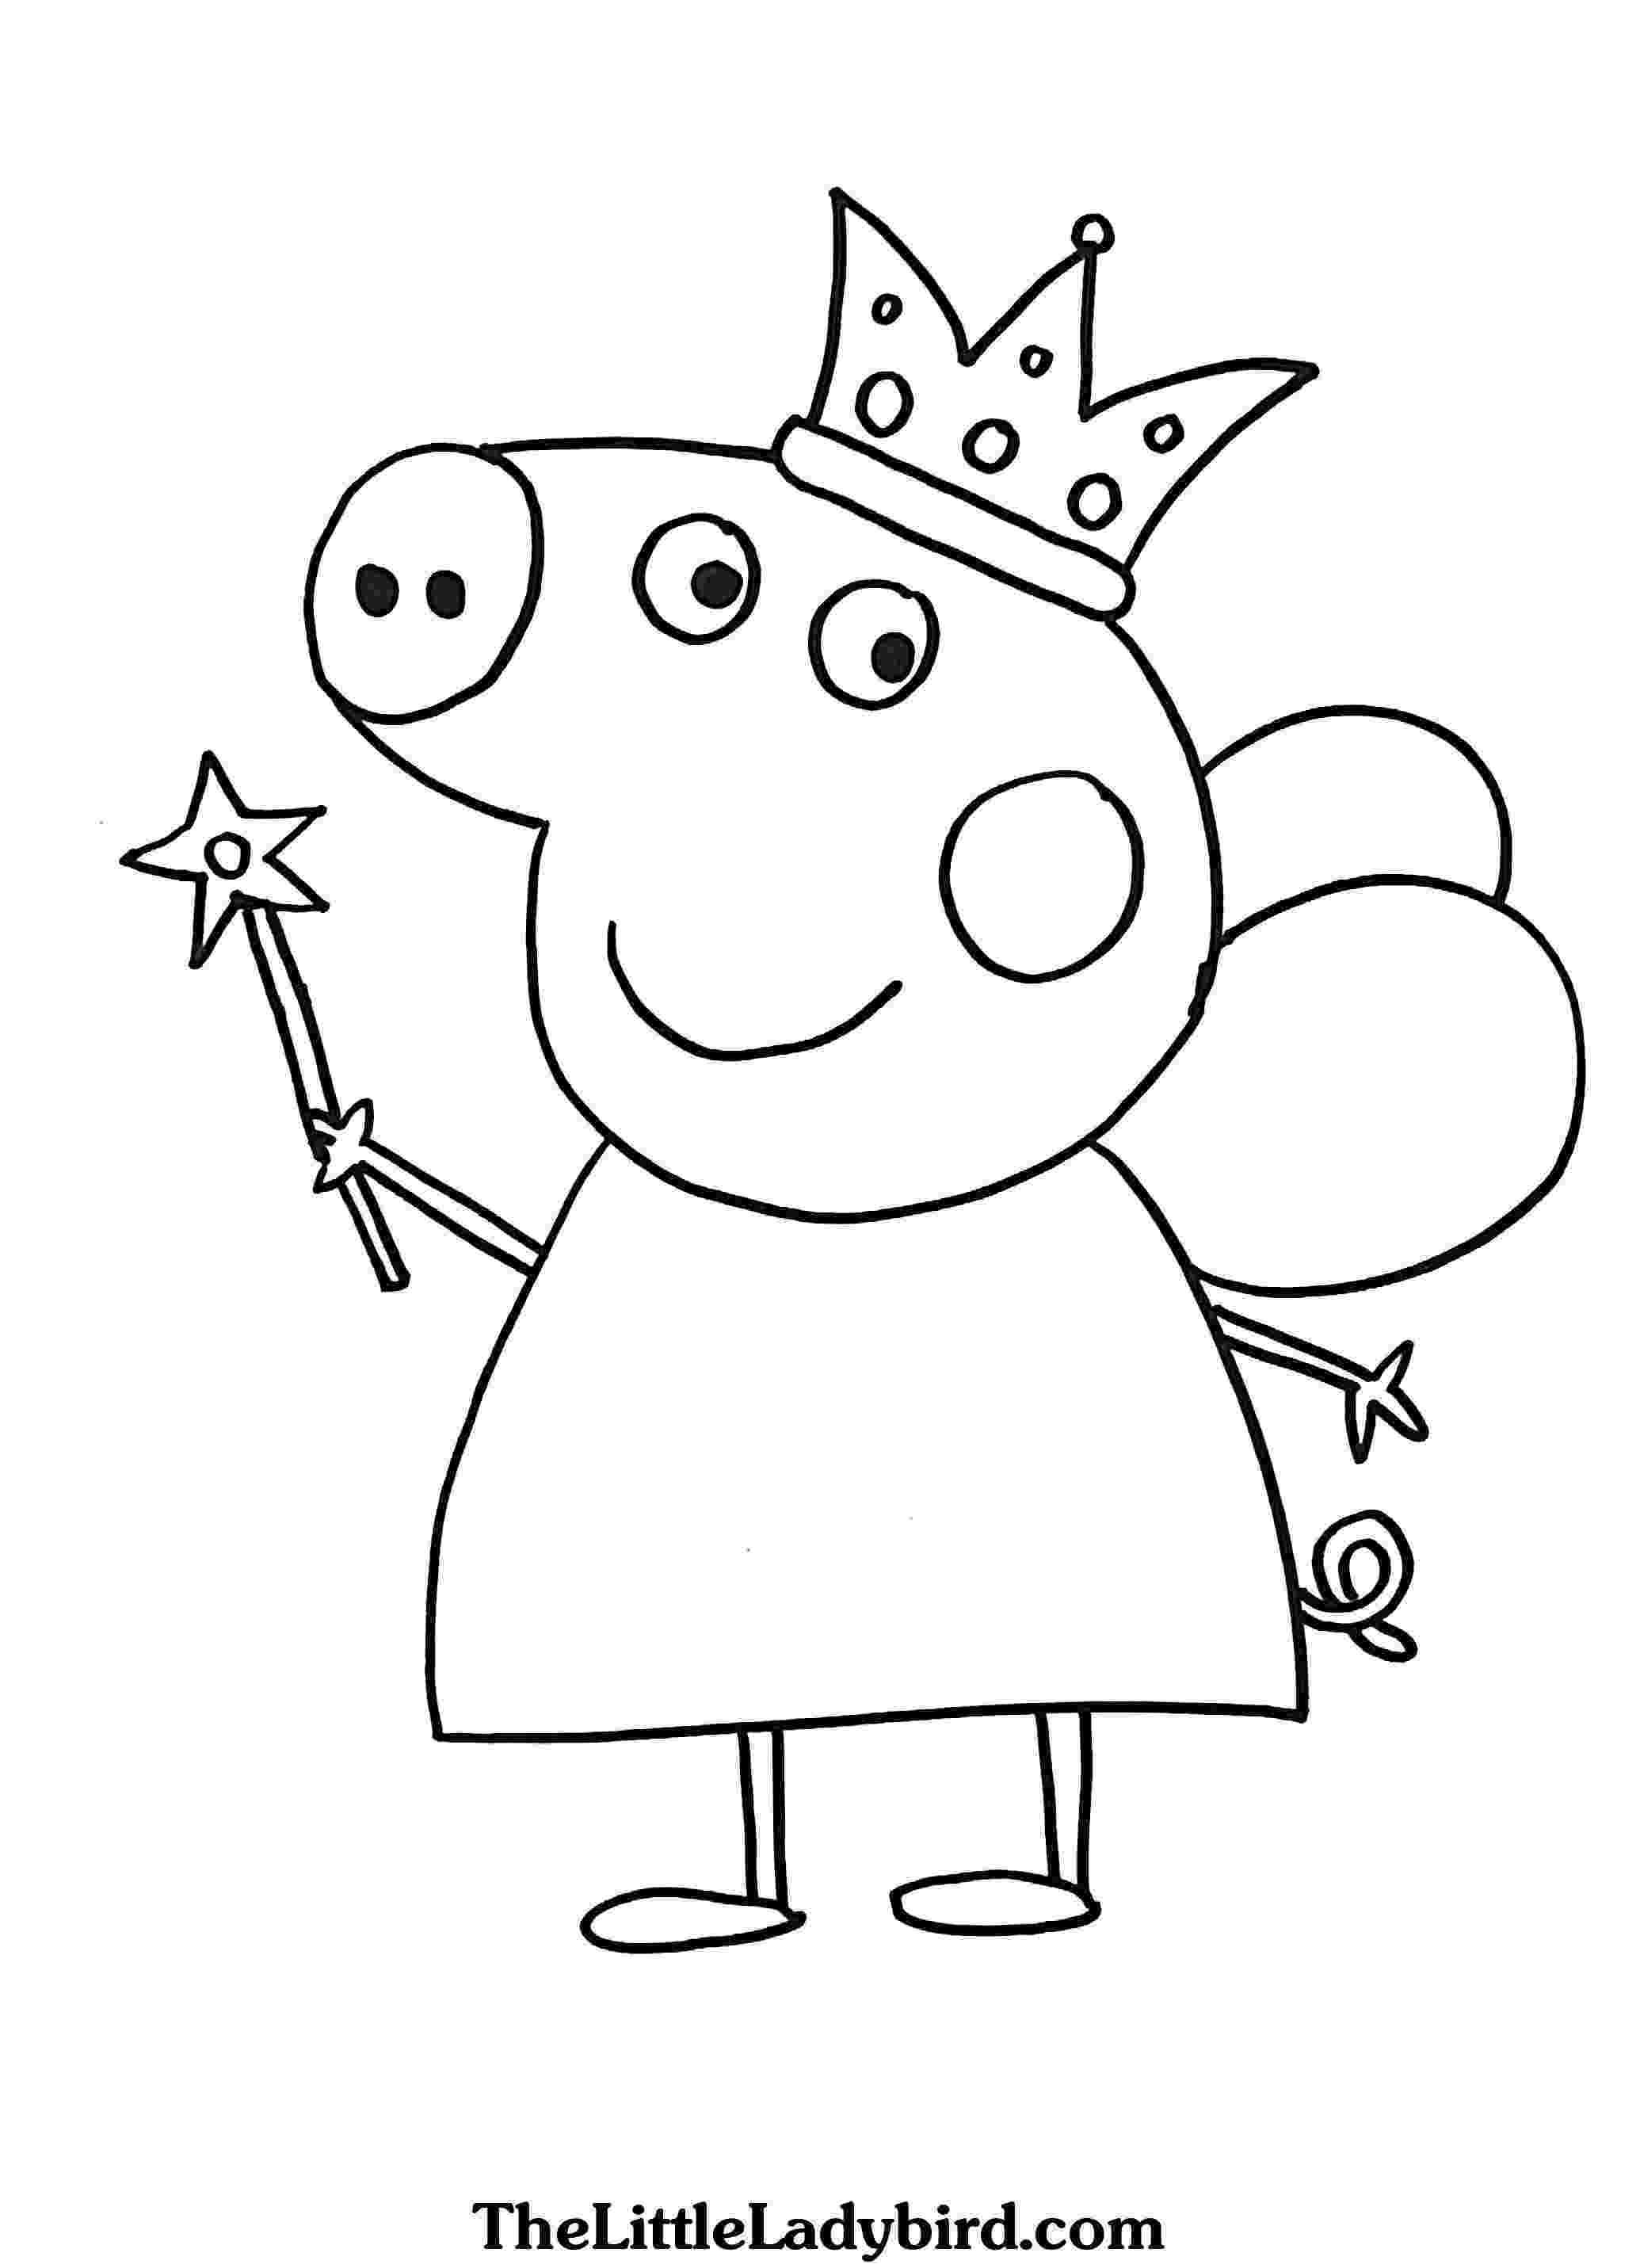 peppa pig colouring printables peppa pig coloring pages peppa pig coloring pages printables pig colouring peppa